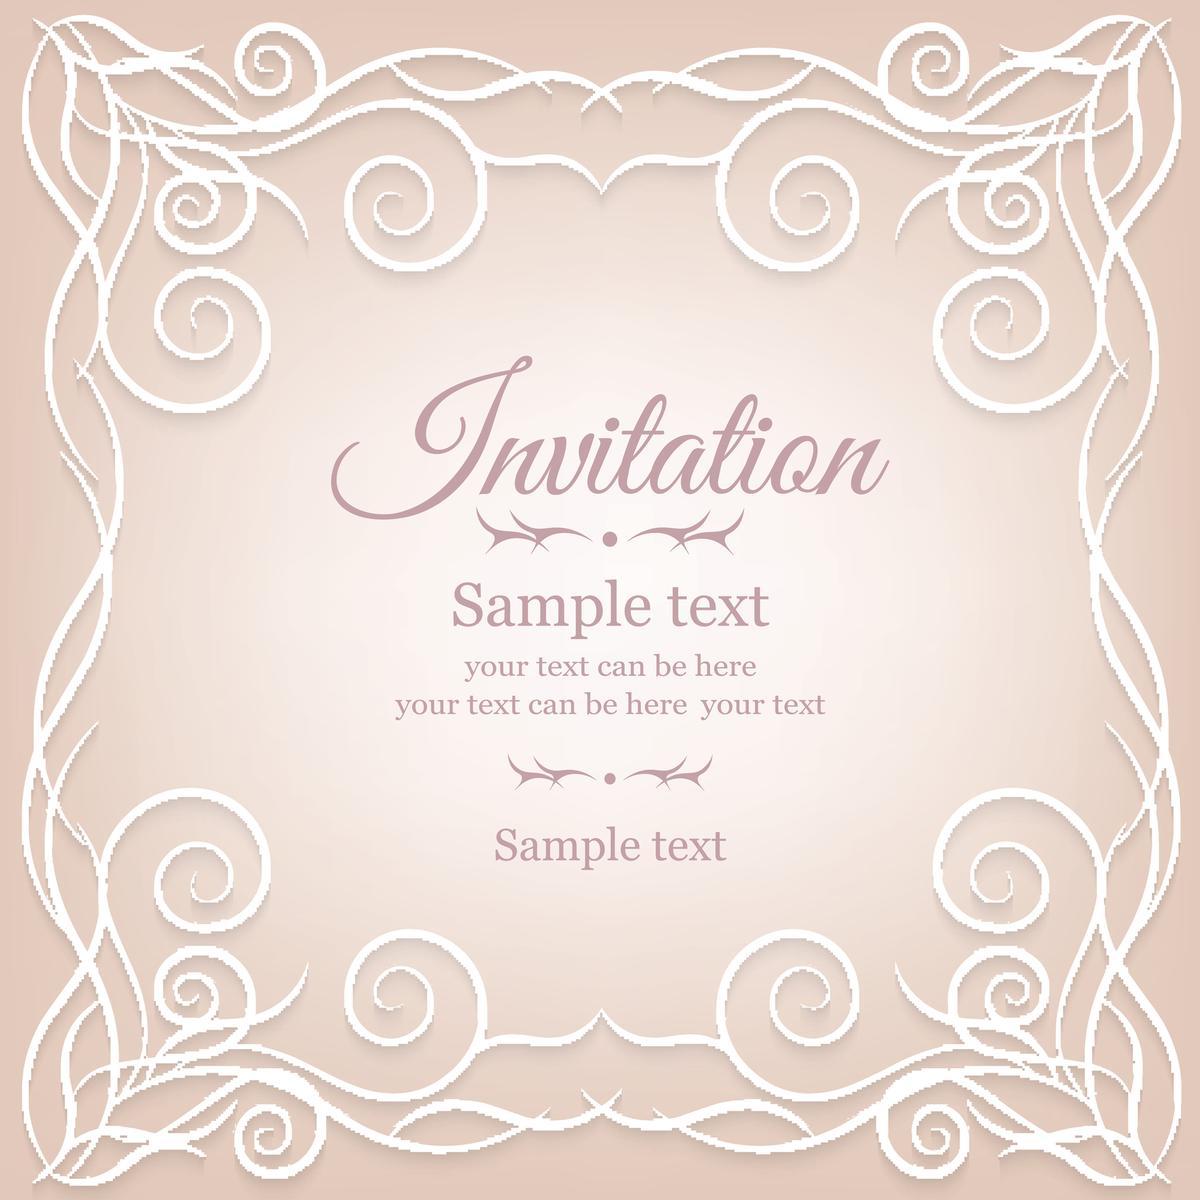 40th birthday invitation wordings that